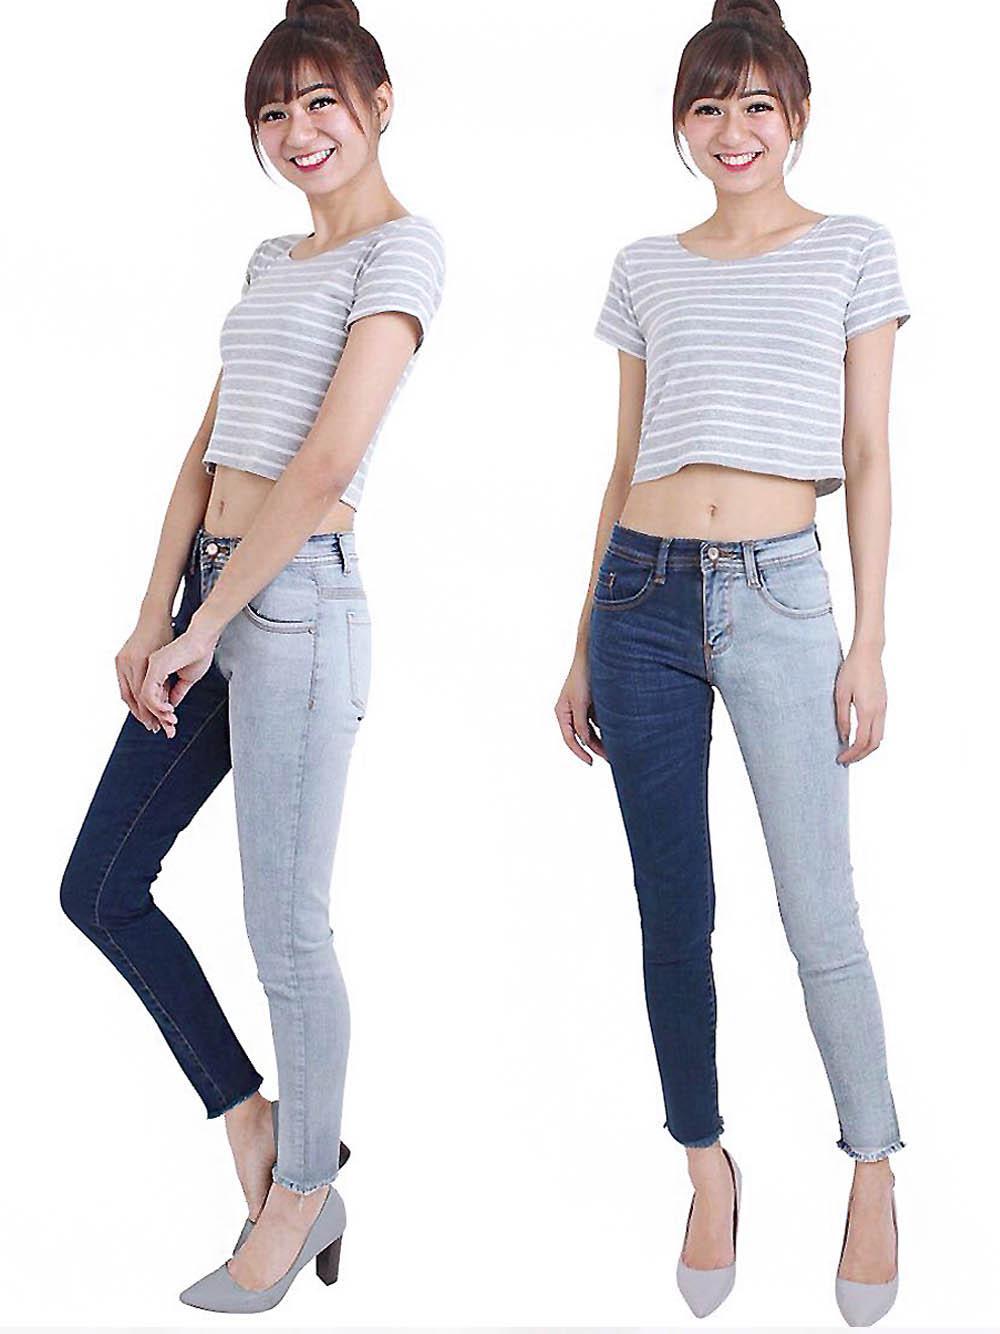 Celana Skinny Jeans Wanita Blouse Fashion- HW TWO FACE MAZ 8483 (MODEL DAN WARNA SESUAI GAMBAR)